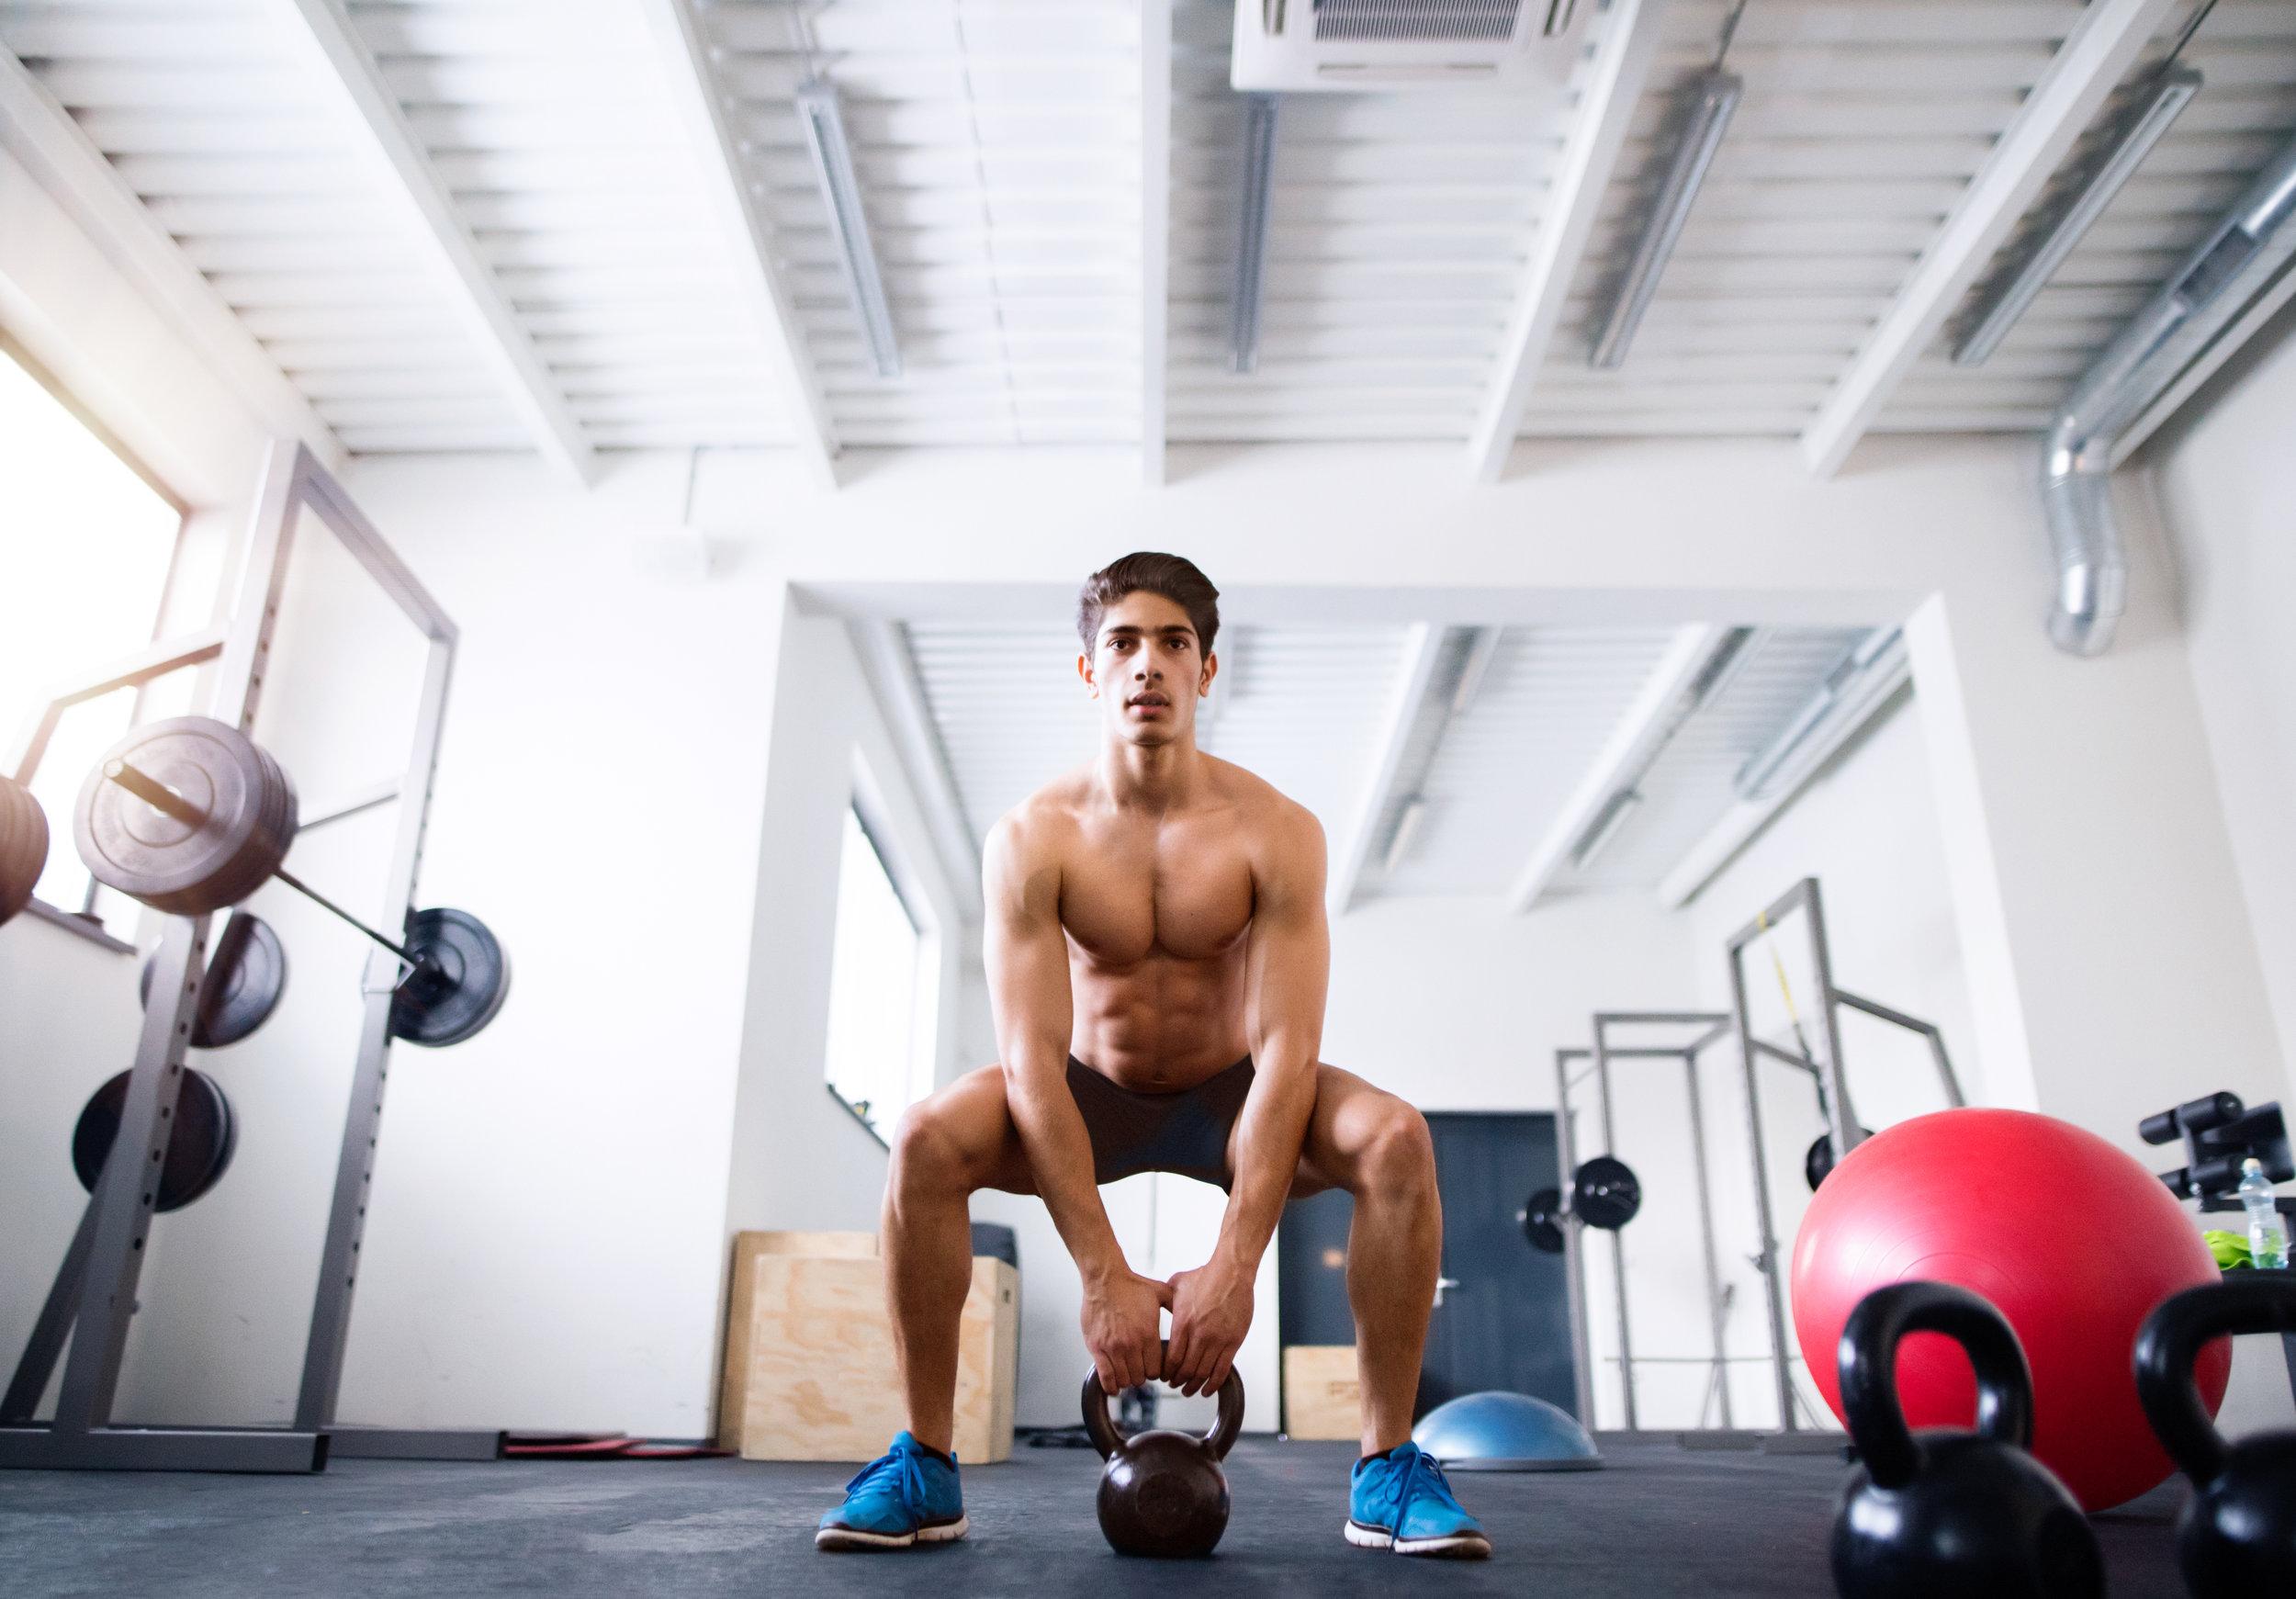 graphicstock-fit-hispanic-man-doing-strength-training-doing-kettlebell-swings-in-crossfit-gym_HdpUKiLMb.jpg